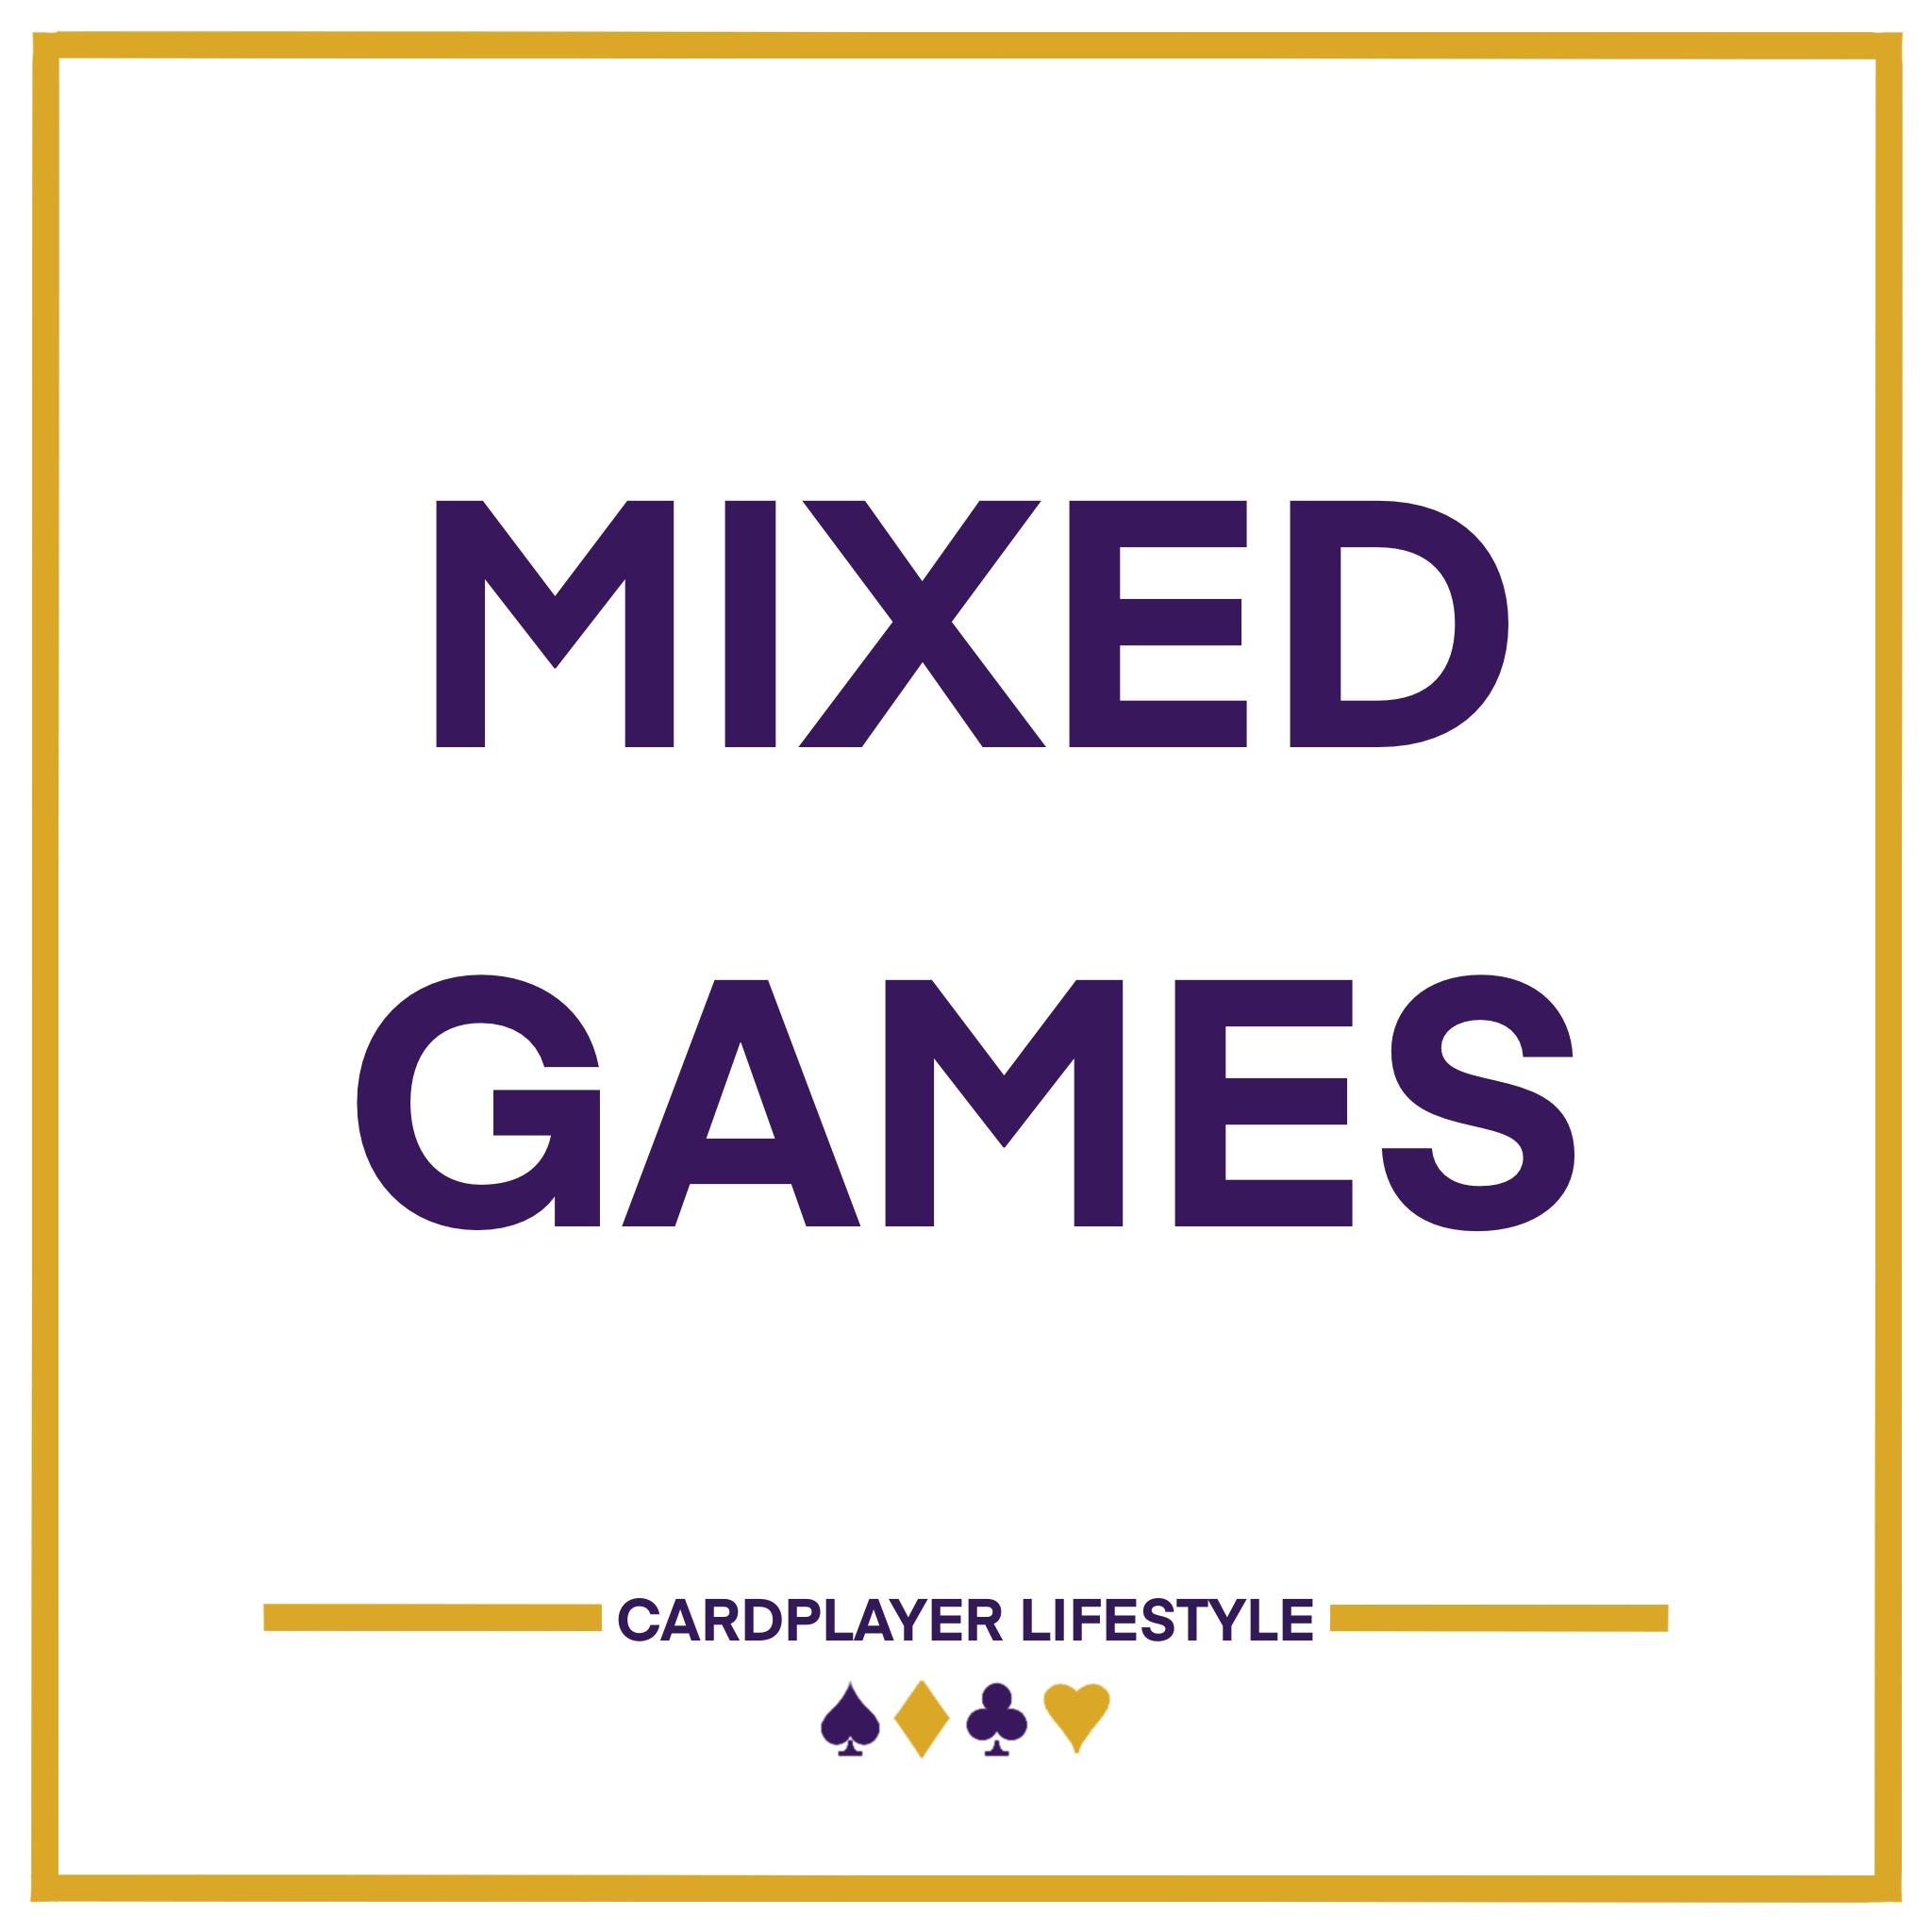 Mixed Games